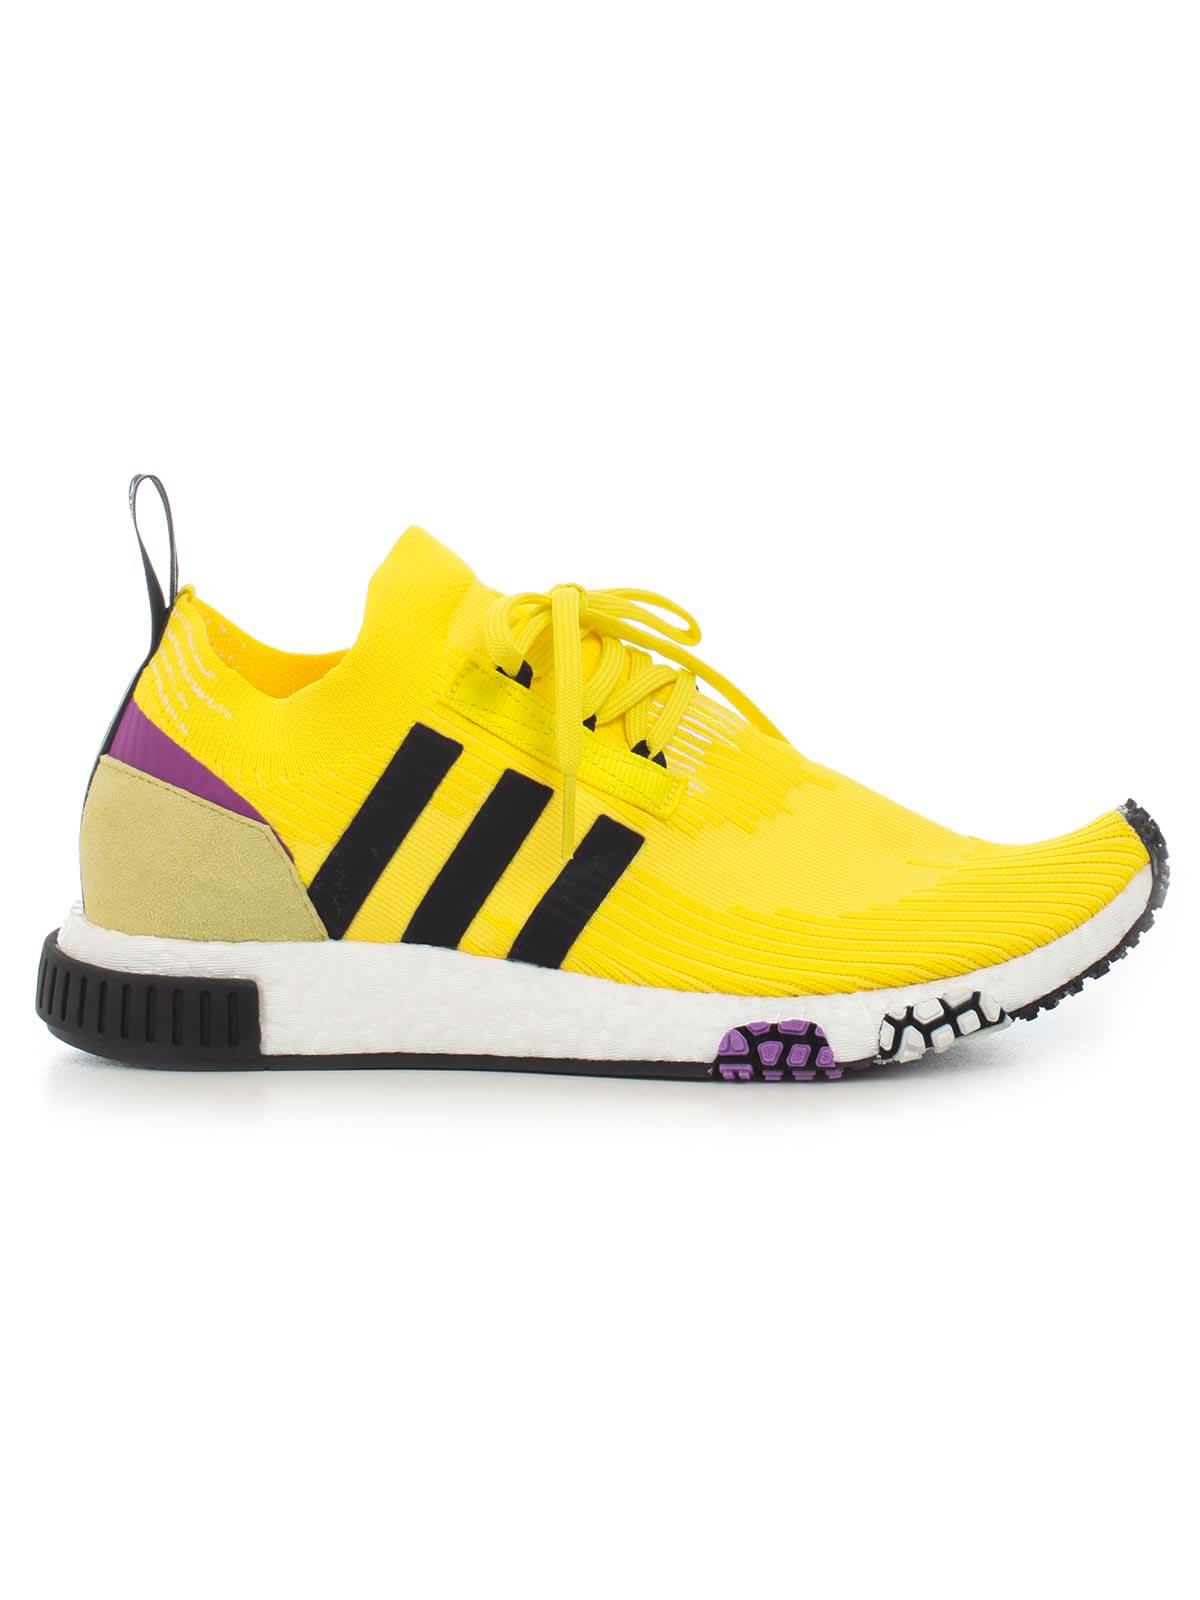 a1446fd90 Adidas Originals Adidas Originals Nmd Racer Pk Sneakers - Yellow ...